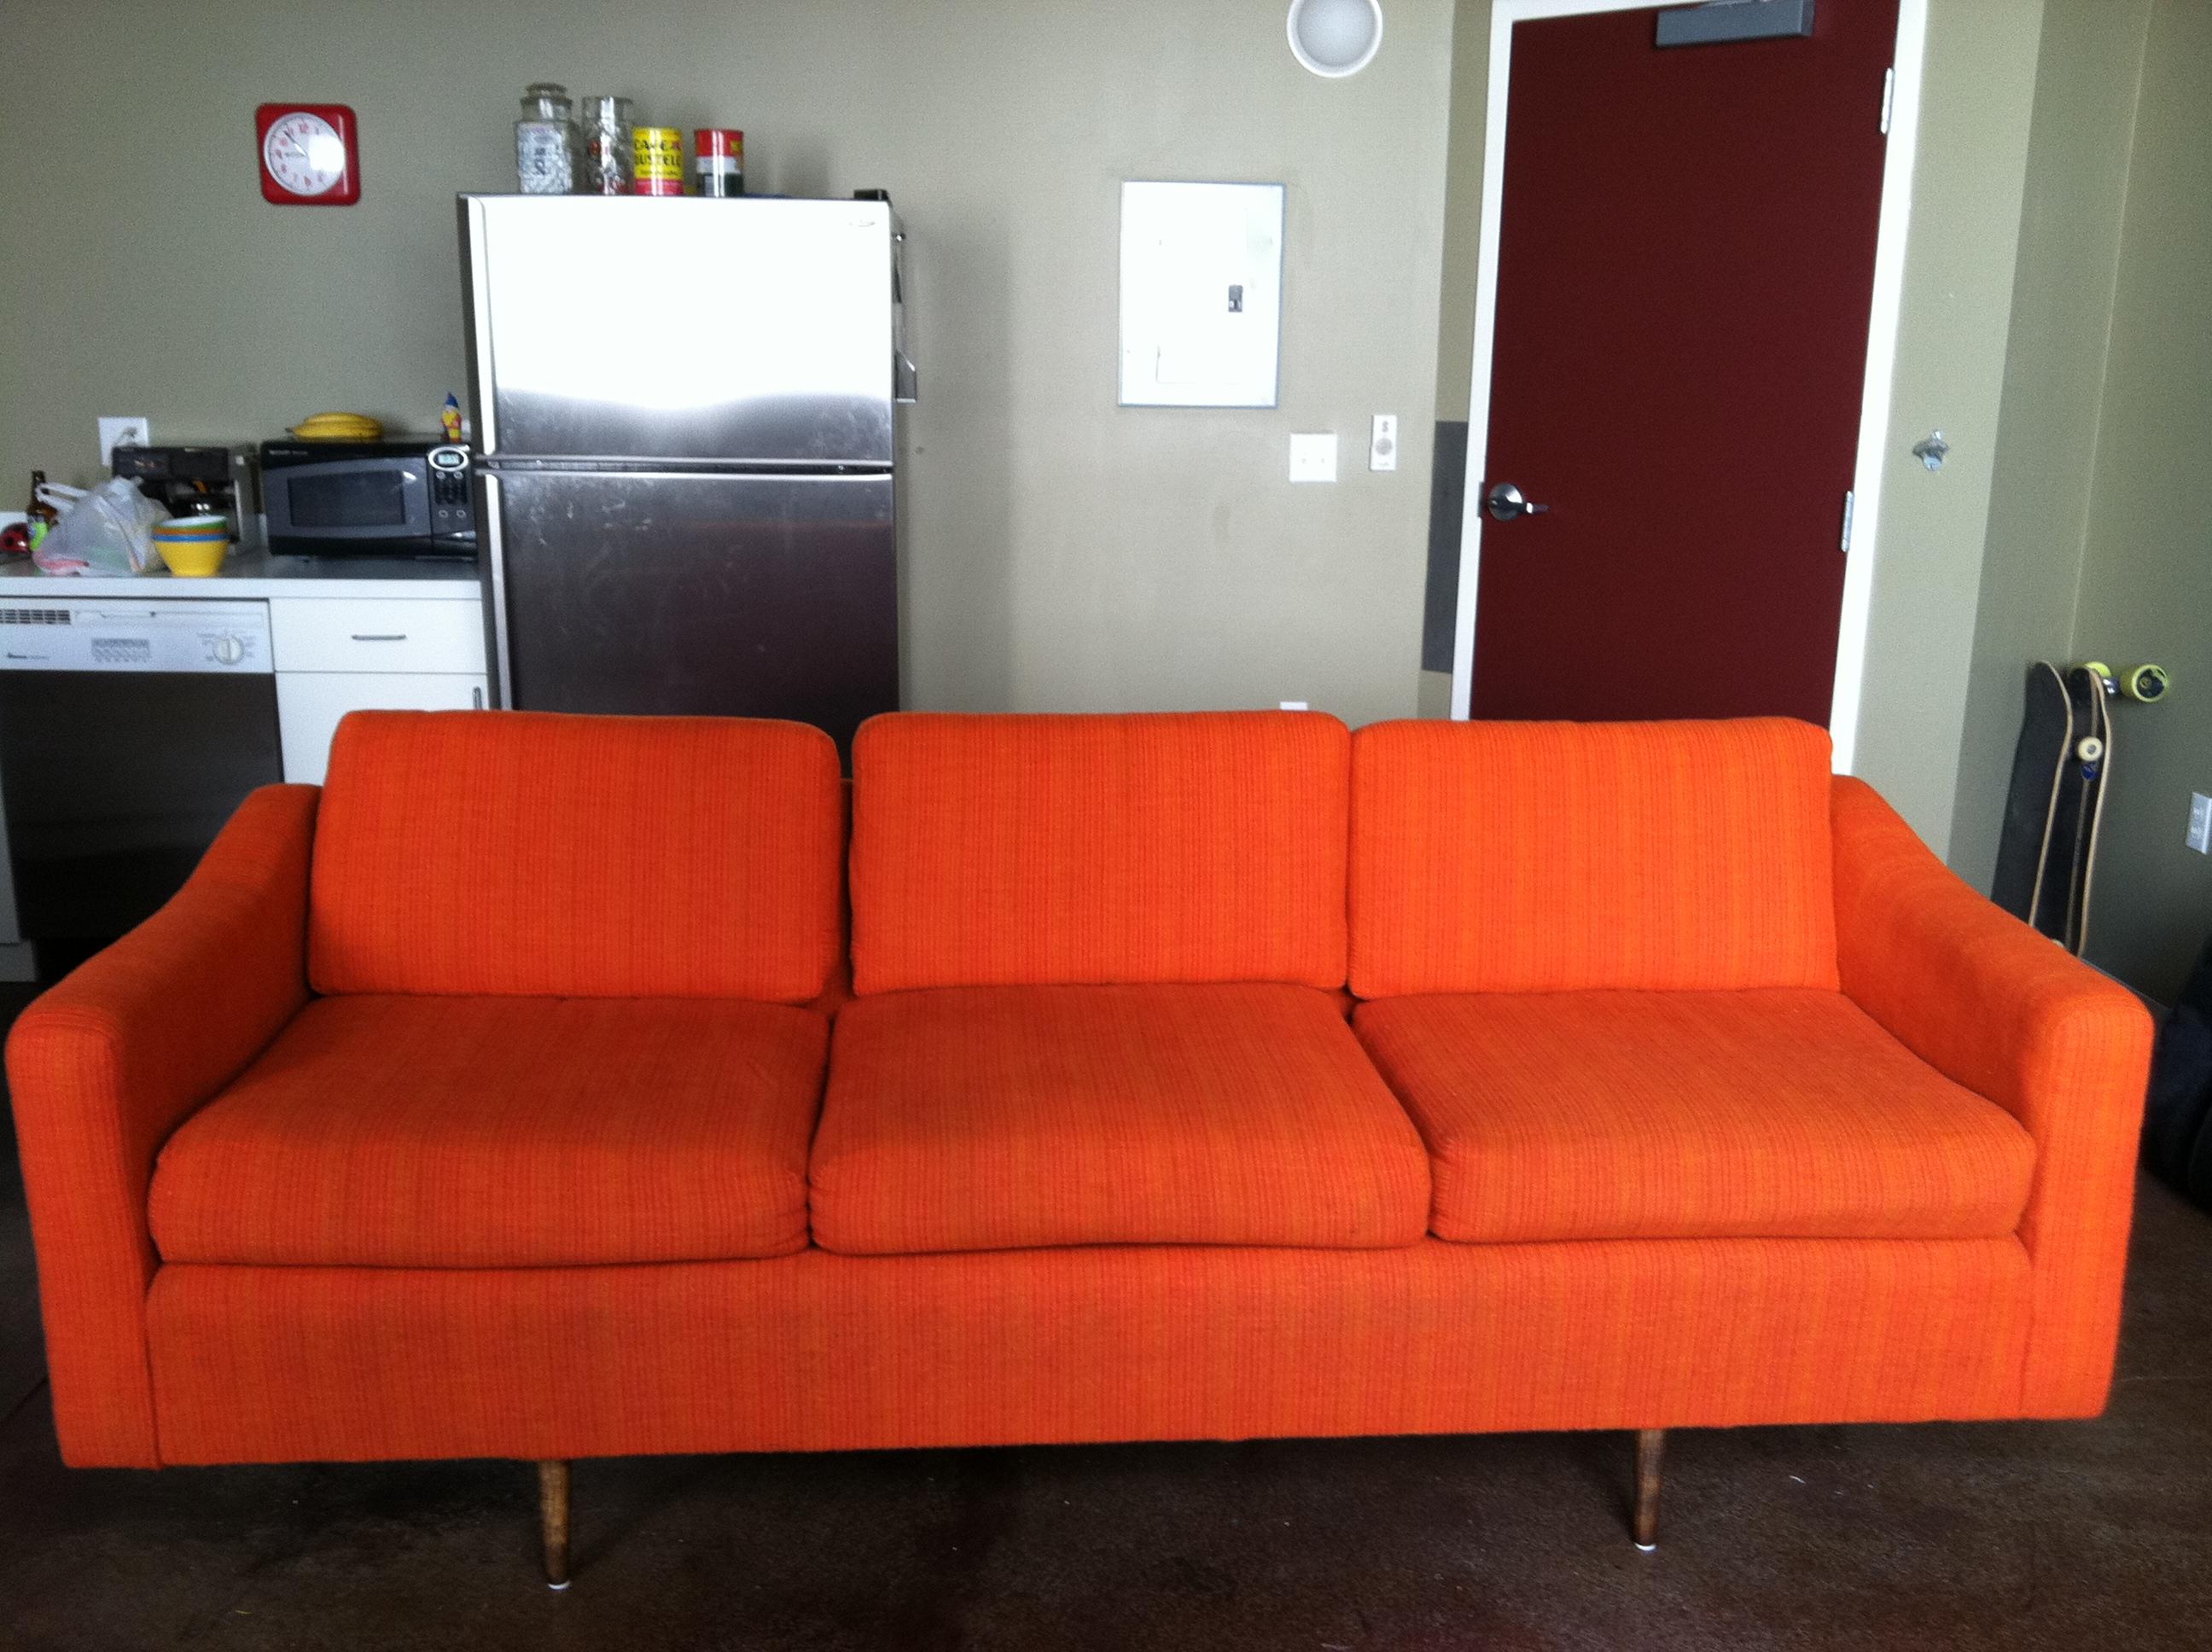 Cornered On Craig S List The Story Of My Bright Orange